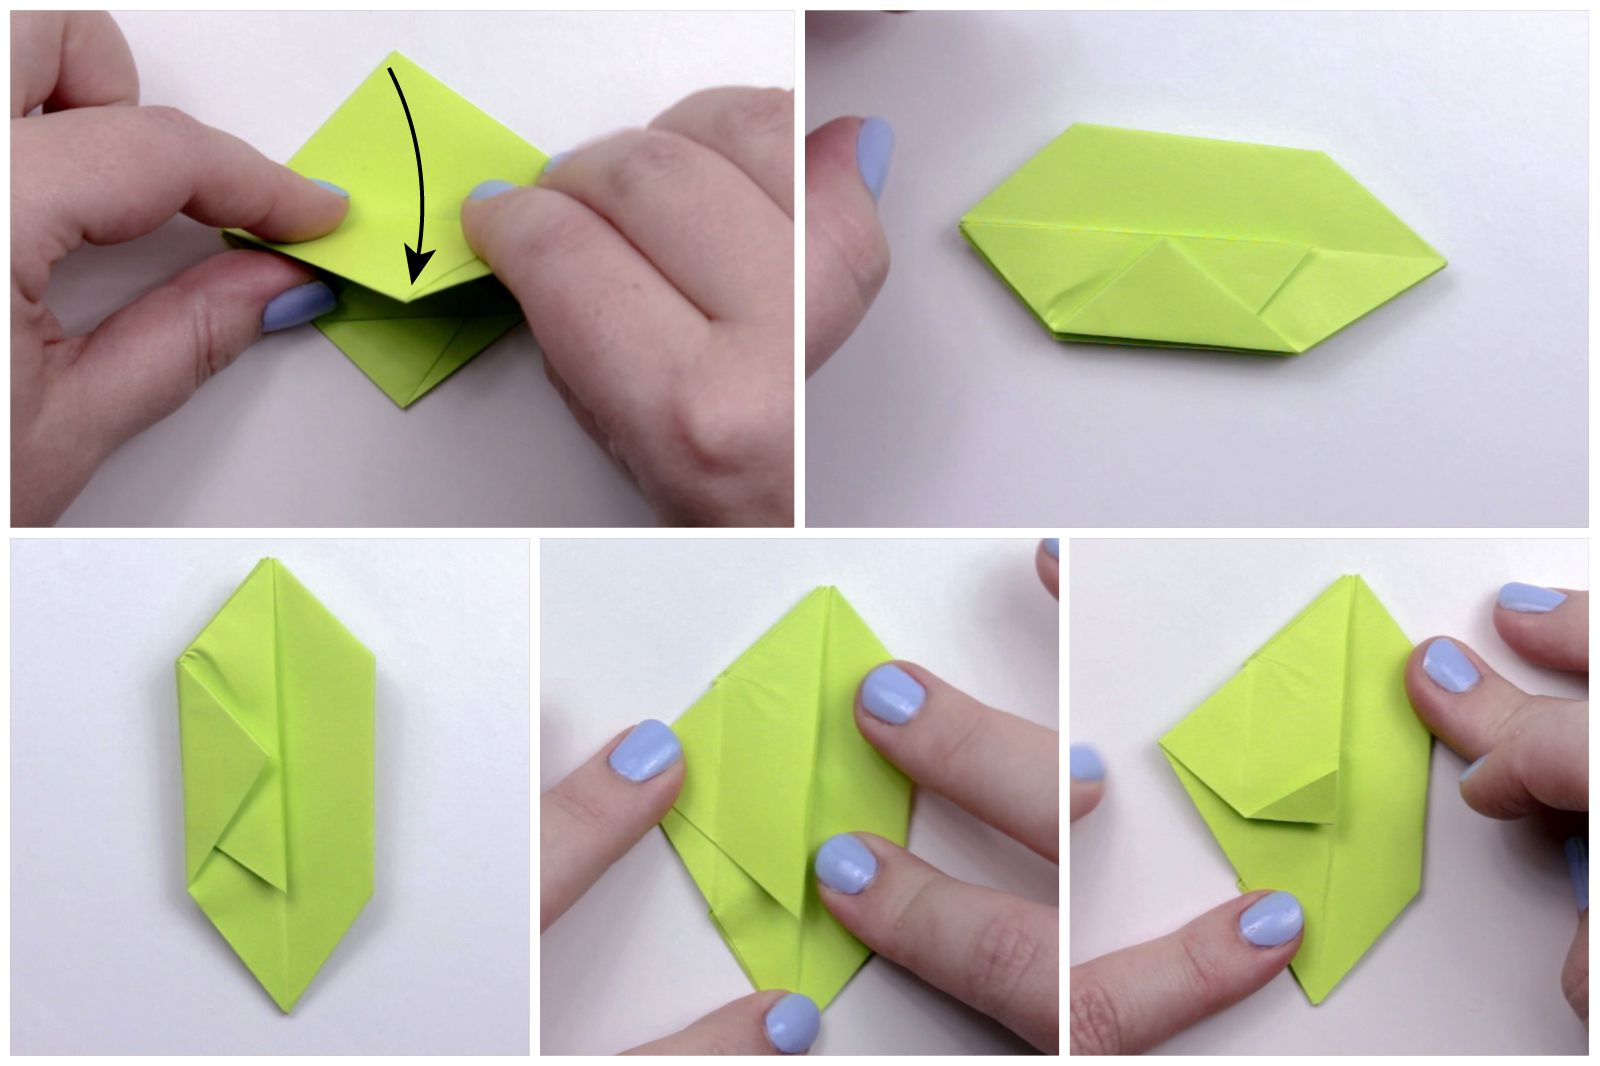 Folding the apple paper to create a kite shape.